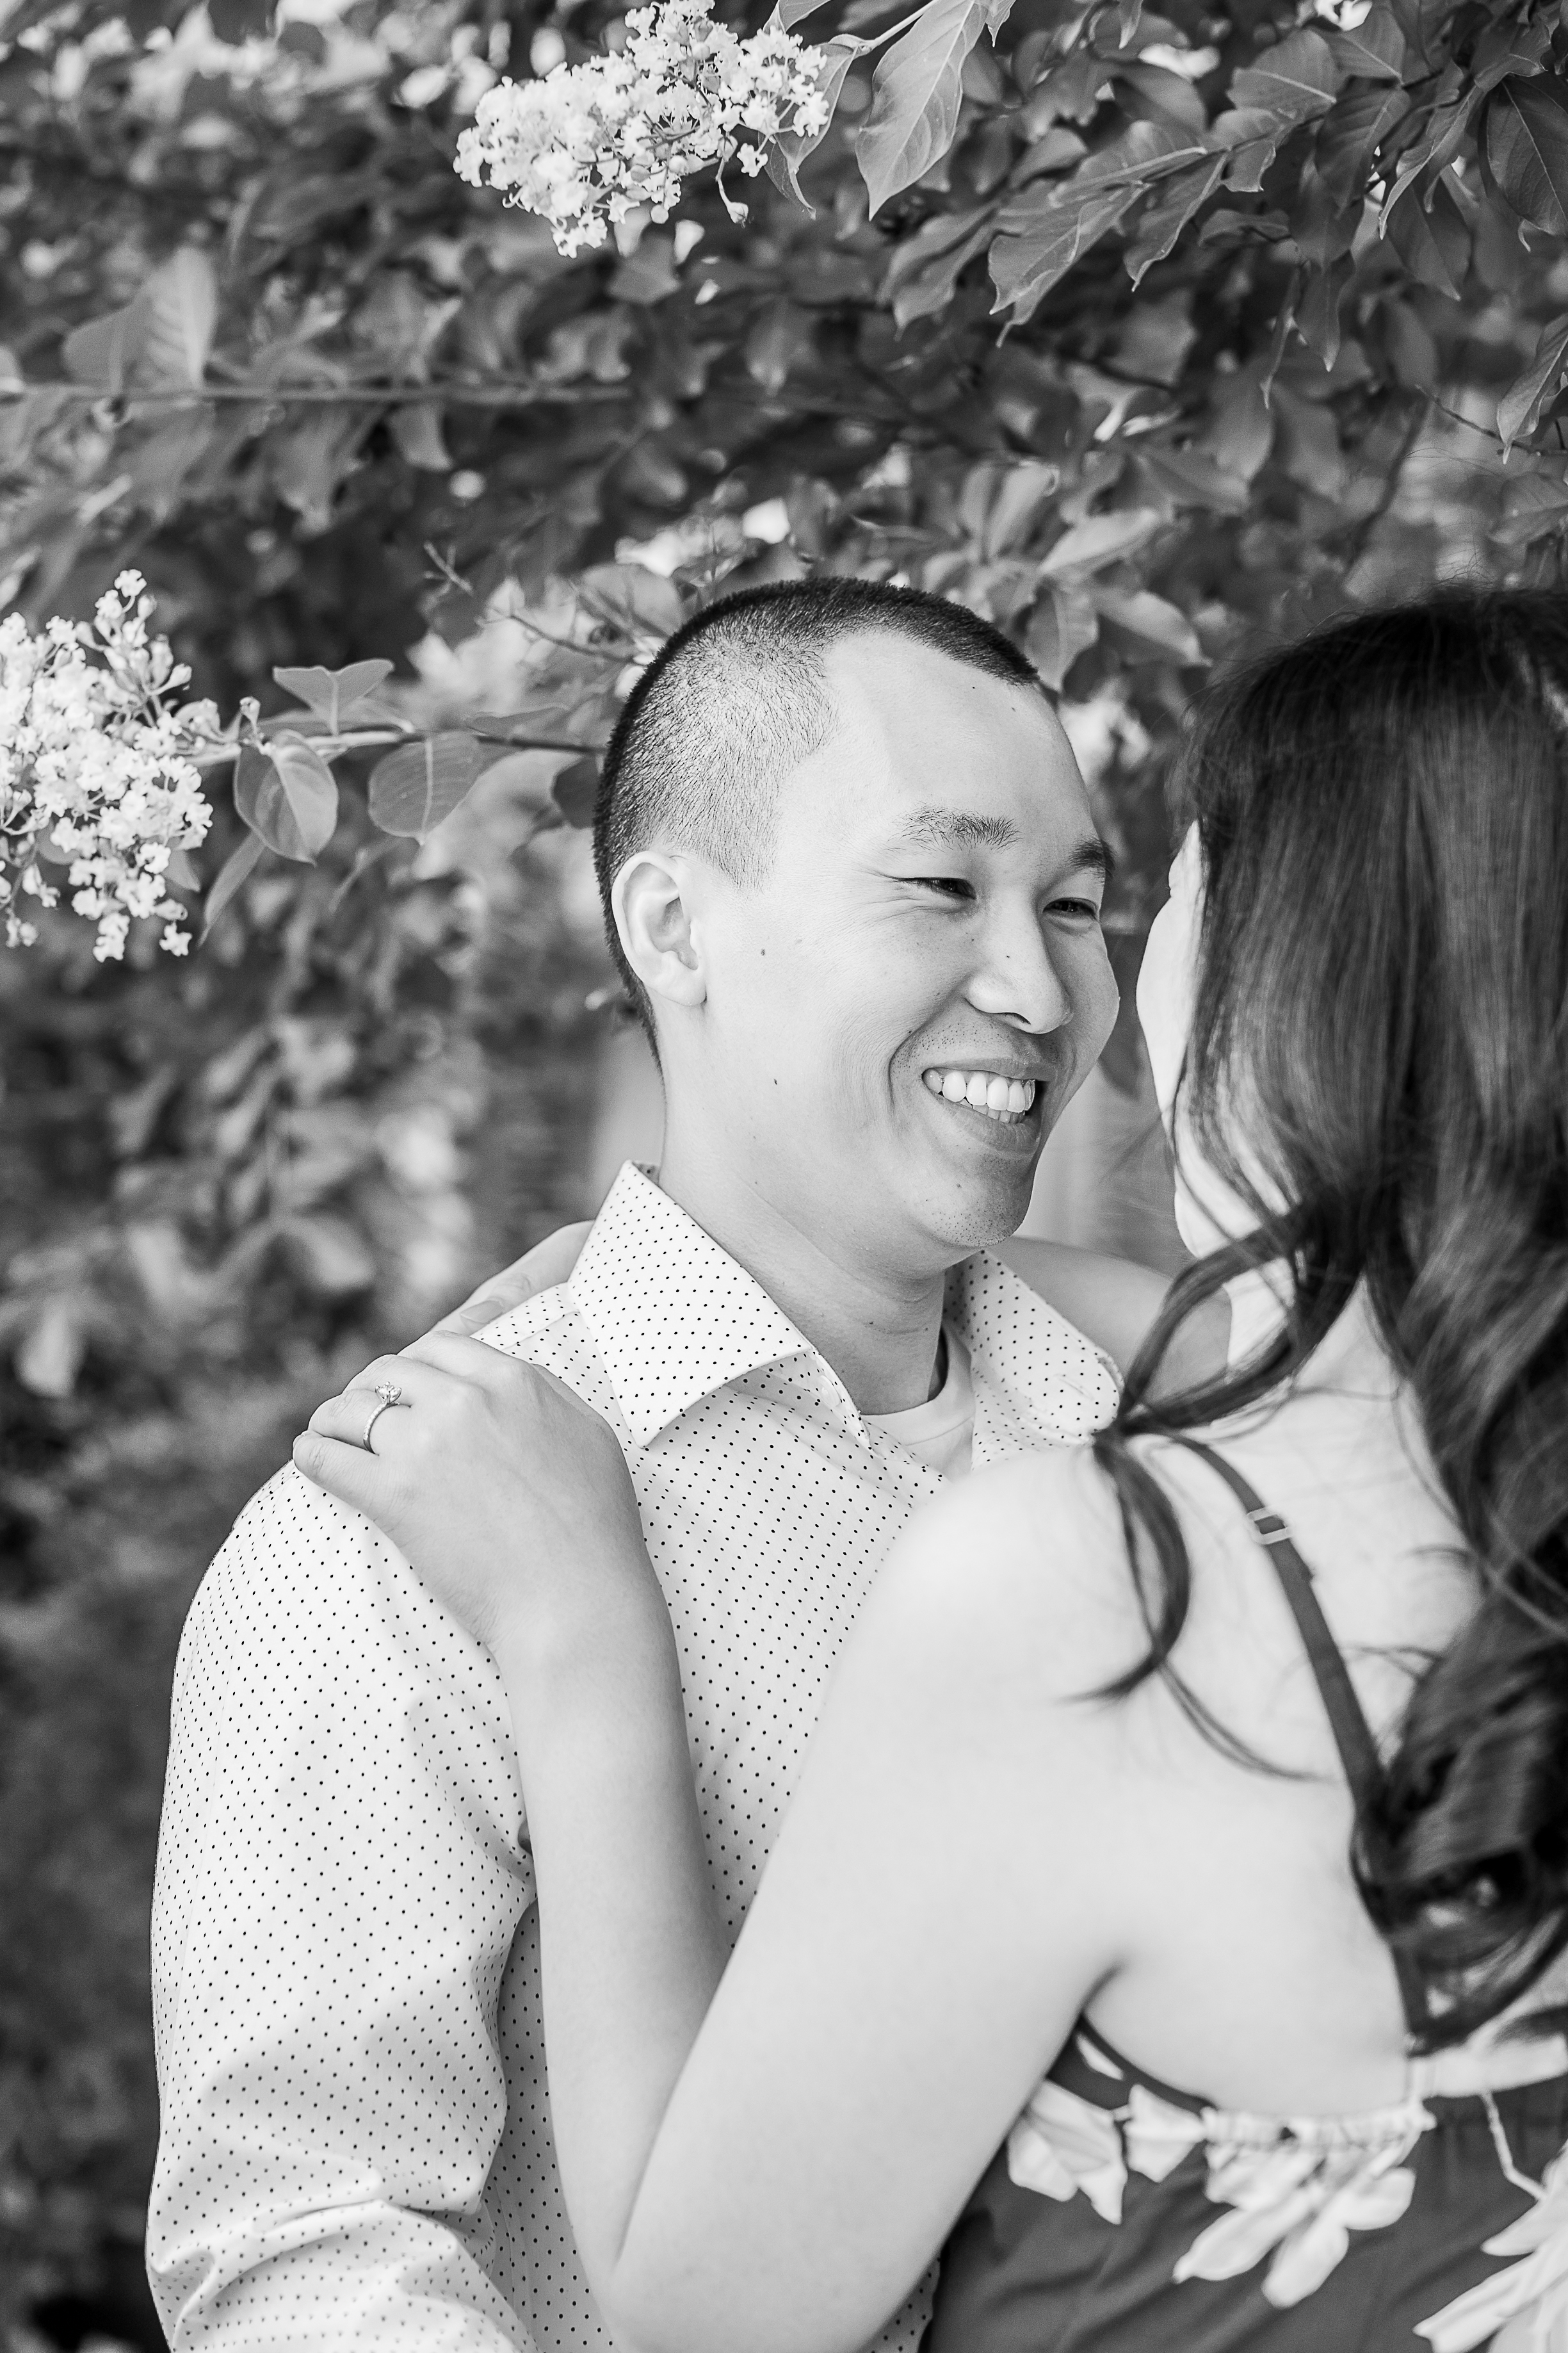 c2 Tammy-Louis-Engagement-Kim-Pham-Clark-Photography-25.jpg